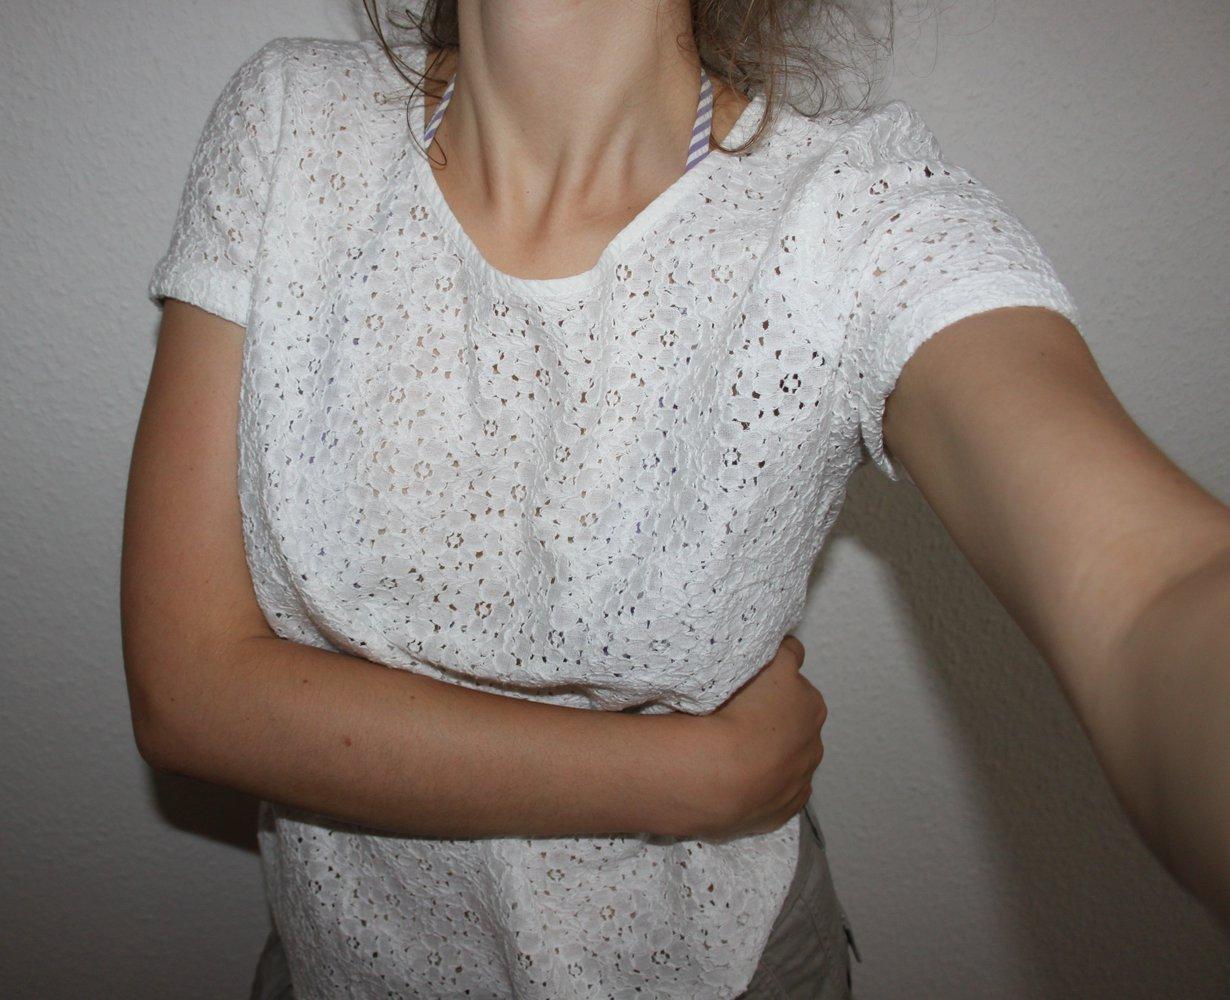 383ec44acc089e VILA - Hochwertiges weißes Spitzenshirt aus Baumwolle    Kleiderkorb.de